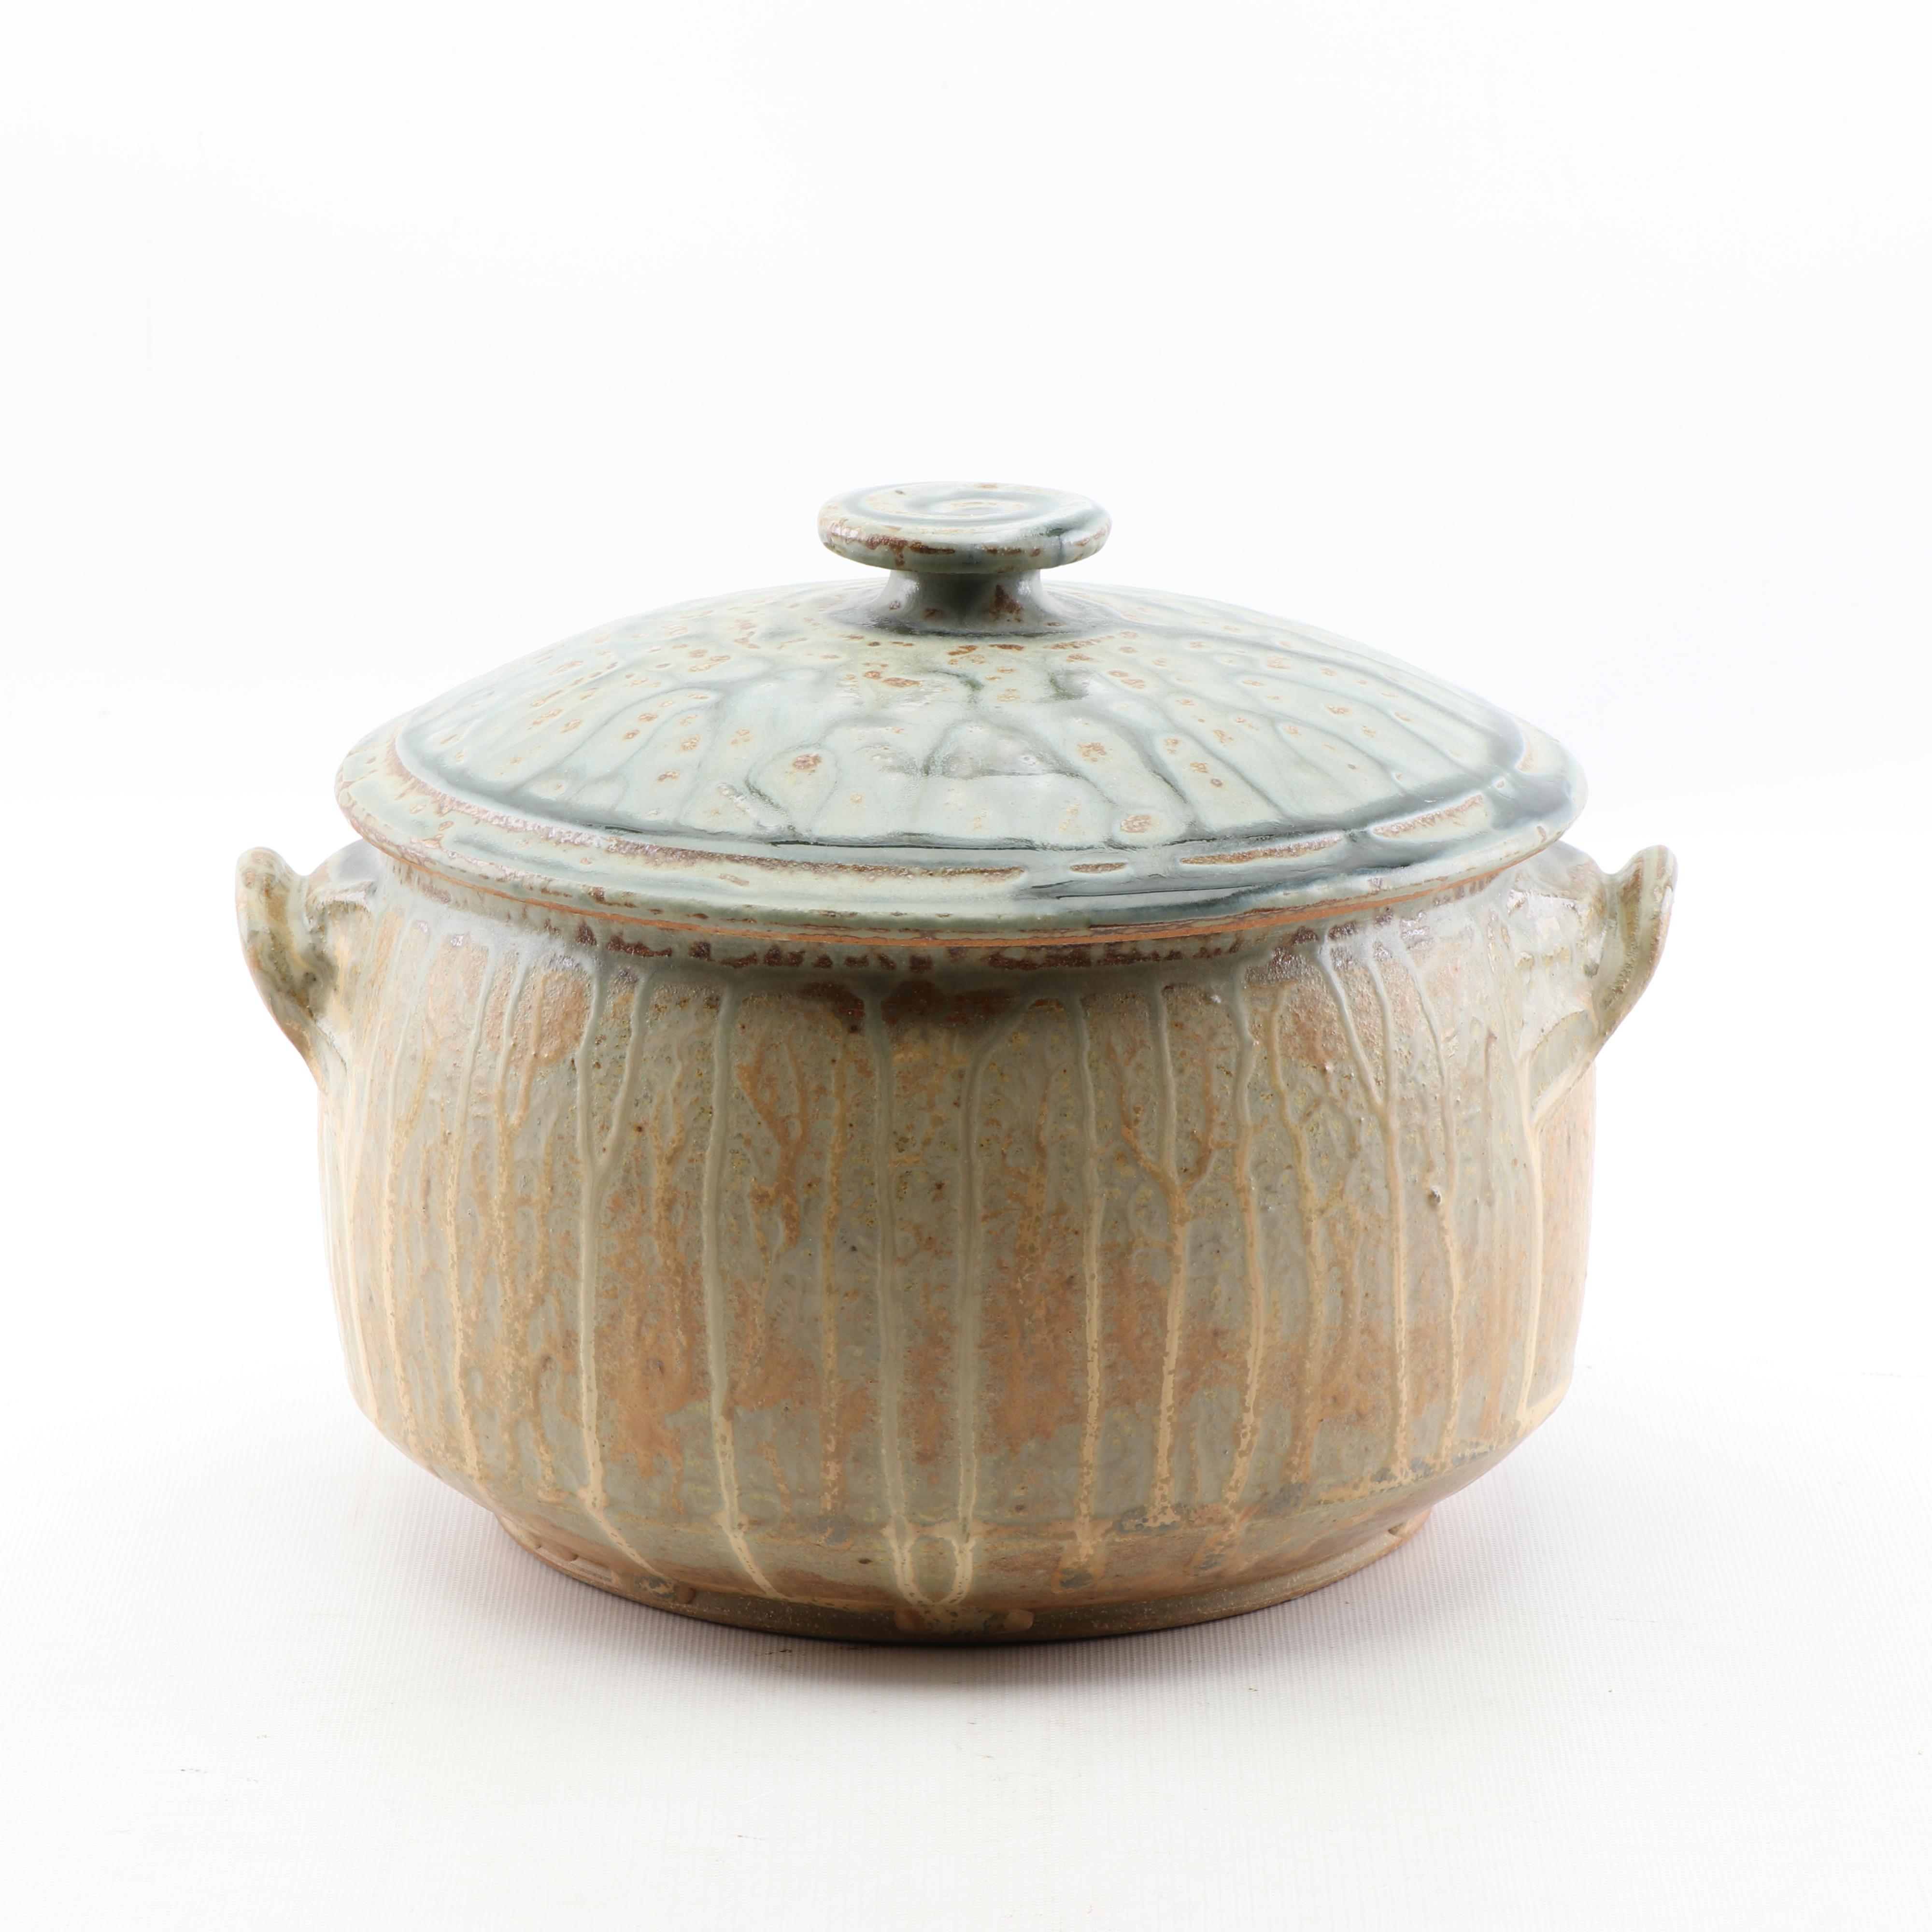 Wheel Thrown Stoneware Lidded Casserole Attributed to Tom Homann